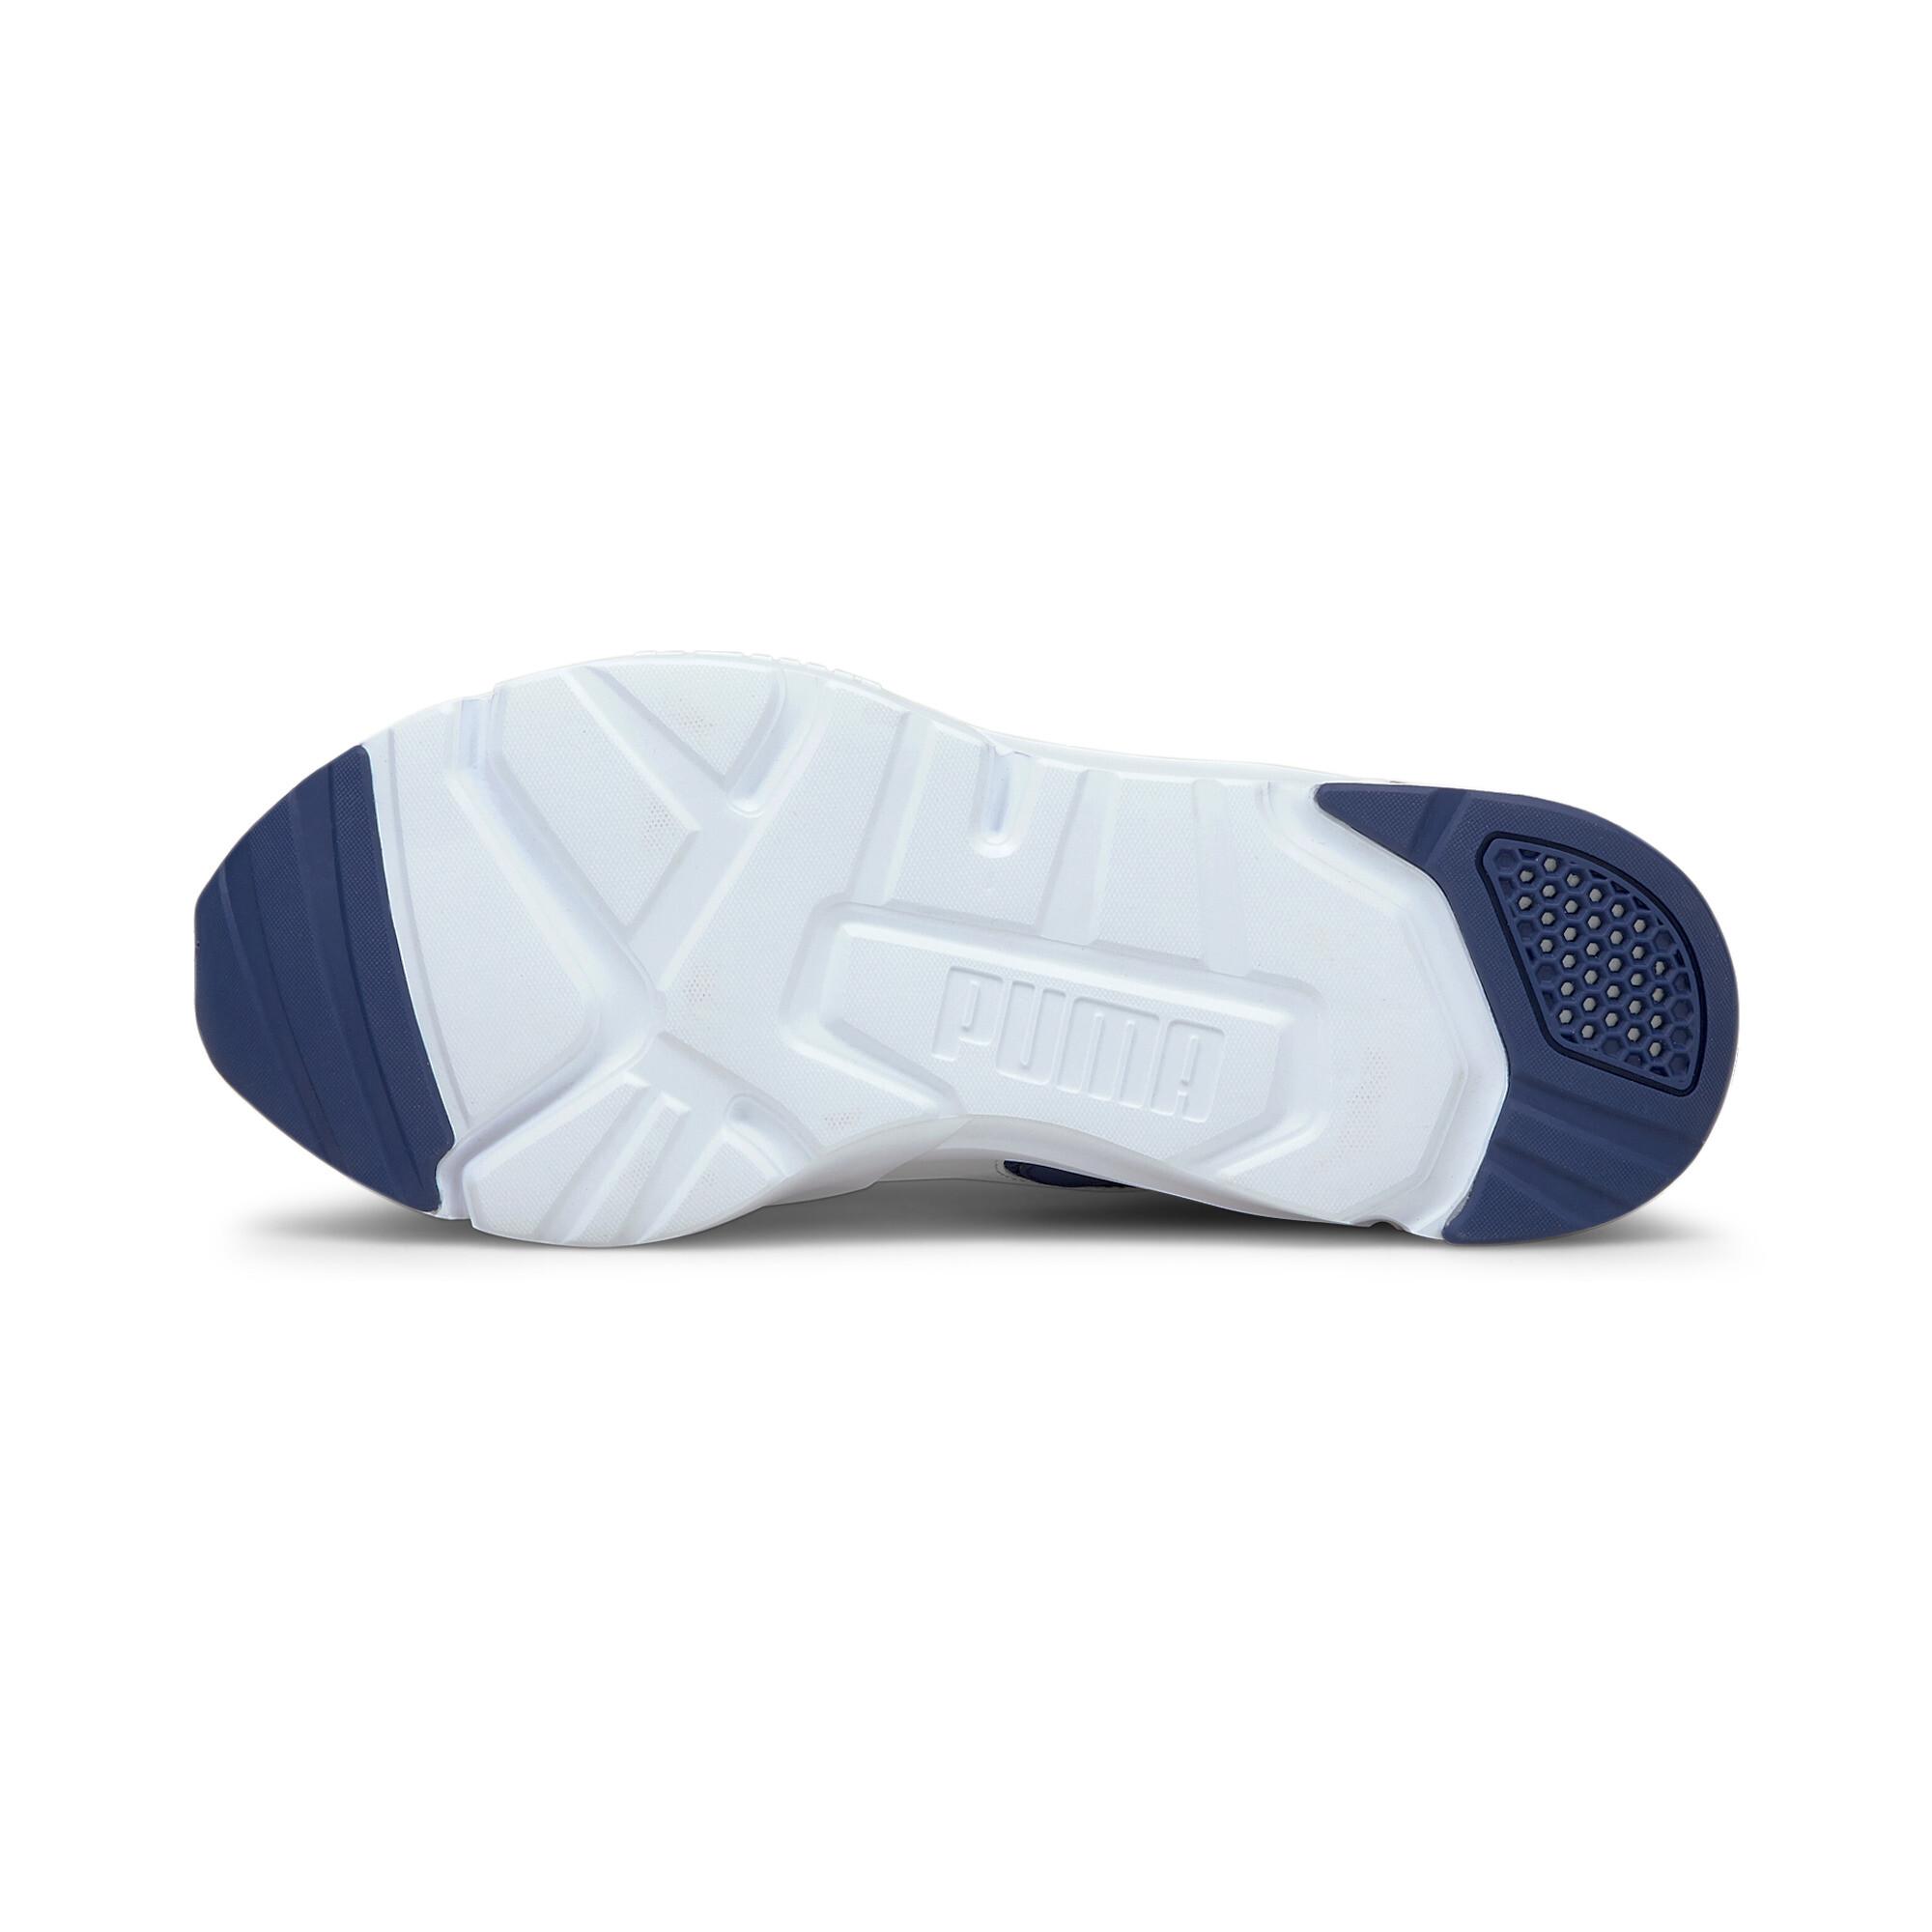 thumbnail 54 - PUMA Men's CELL Pharos Training Shoes